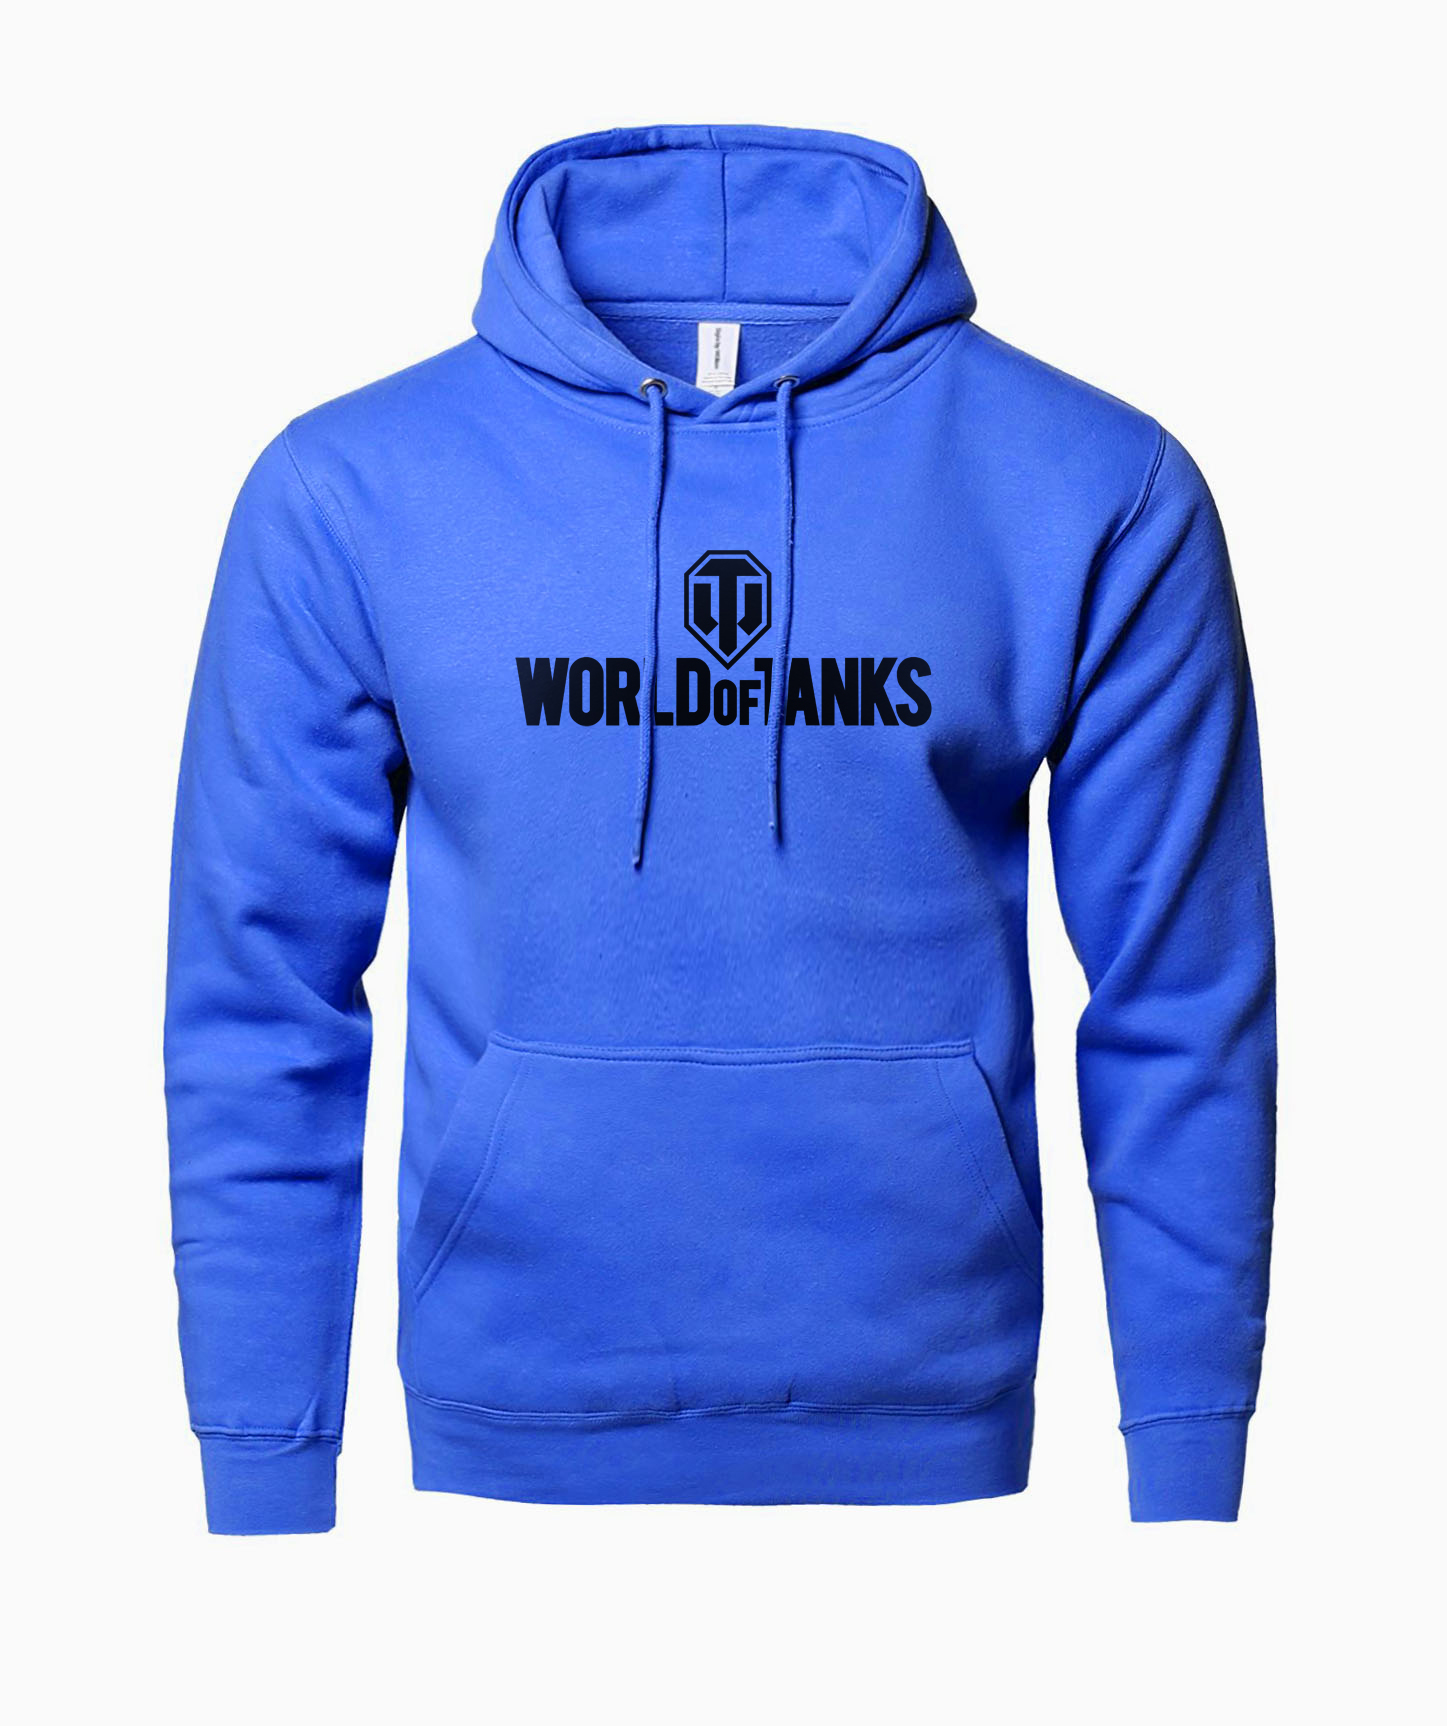 2019 spring winter men hoodies sweatshirt hooded men World War 2 Tank fashion fleece loose fit sudadera hombre